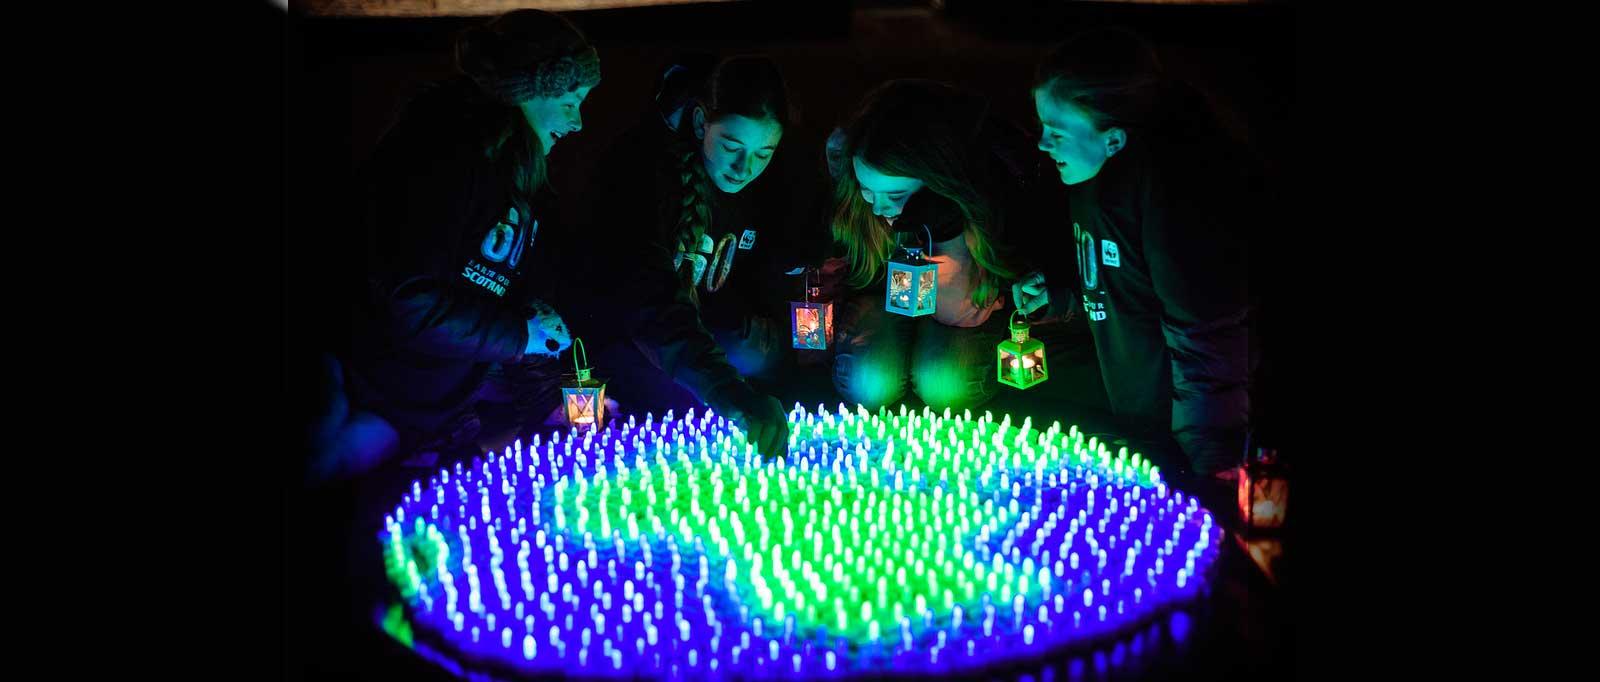 Participants surround glow in the dark globe